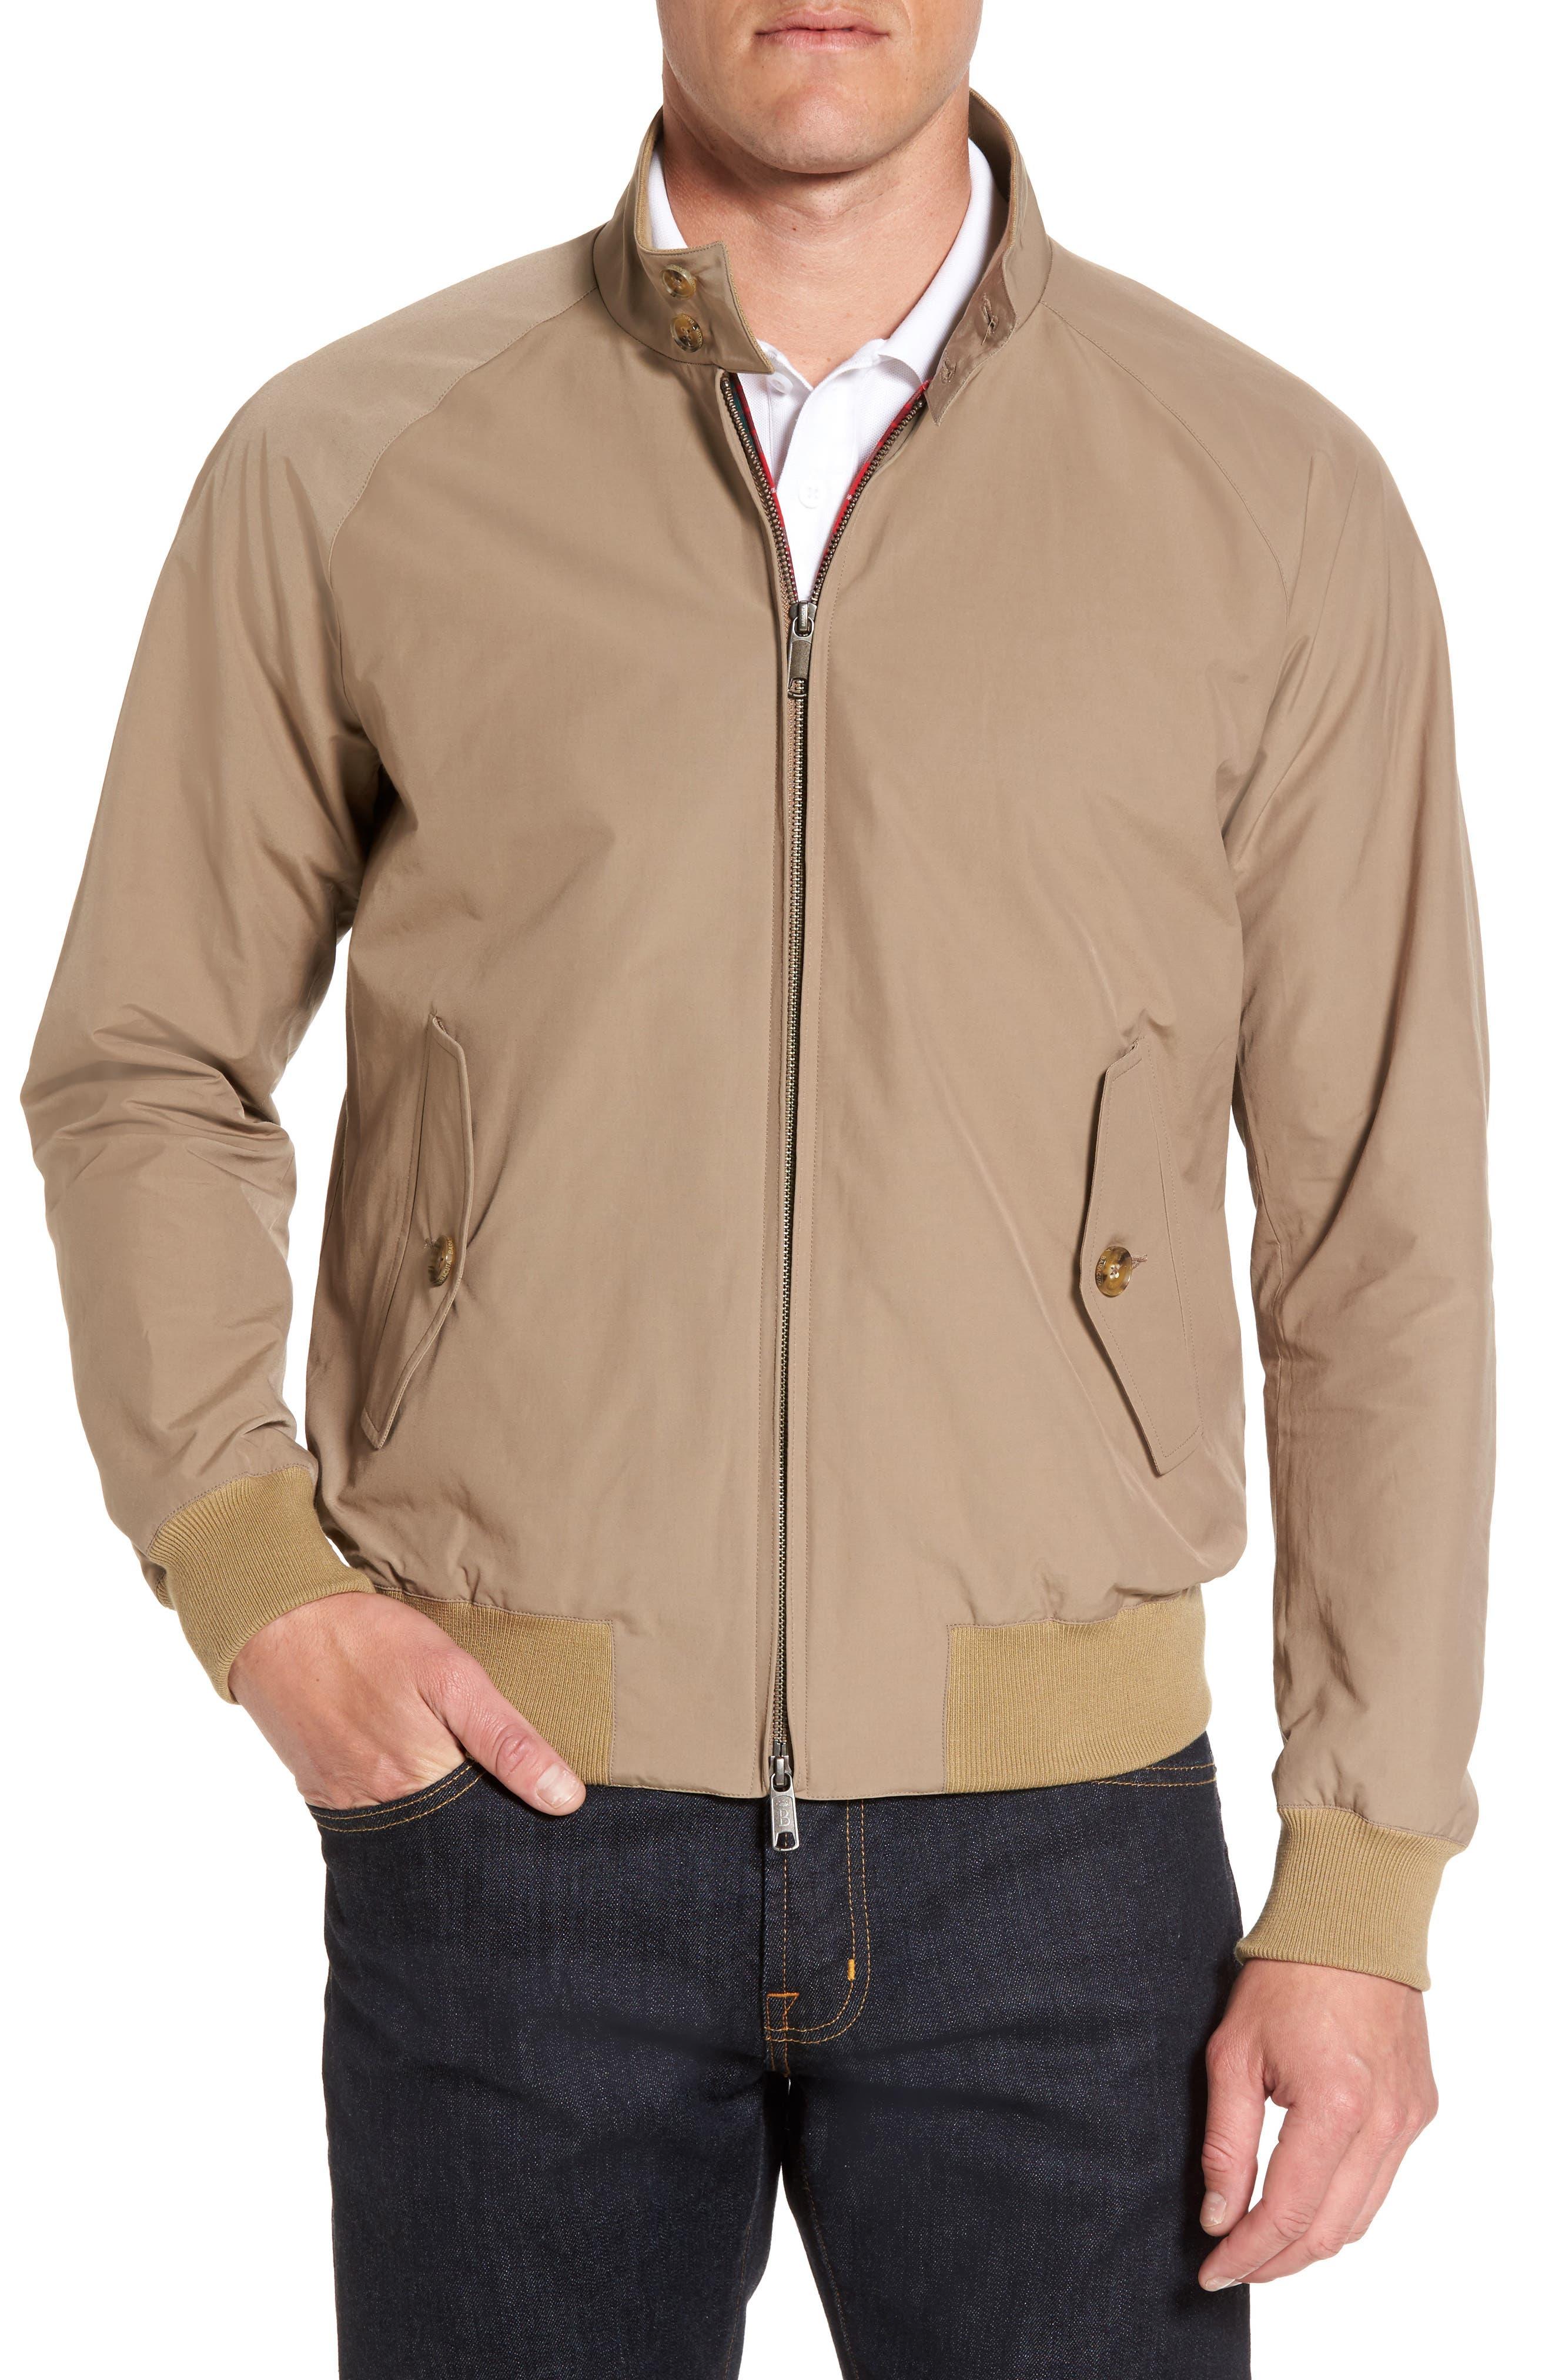 Main Image - Baracuta G9 Water Resistant Harrington Jacket